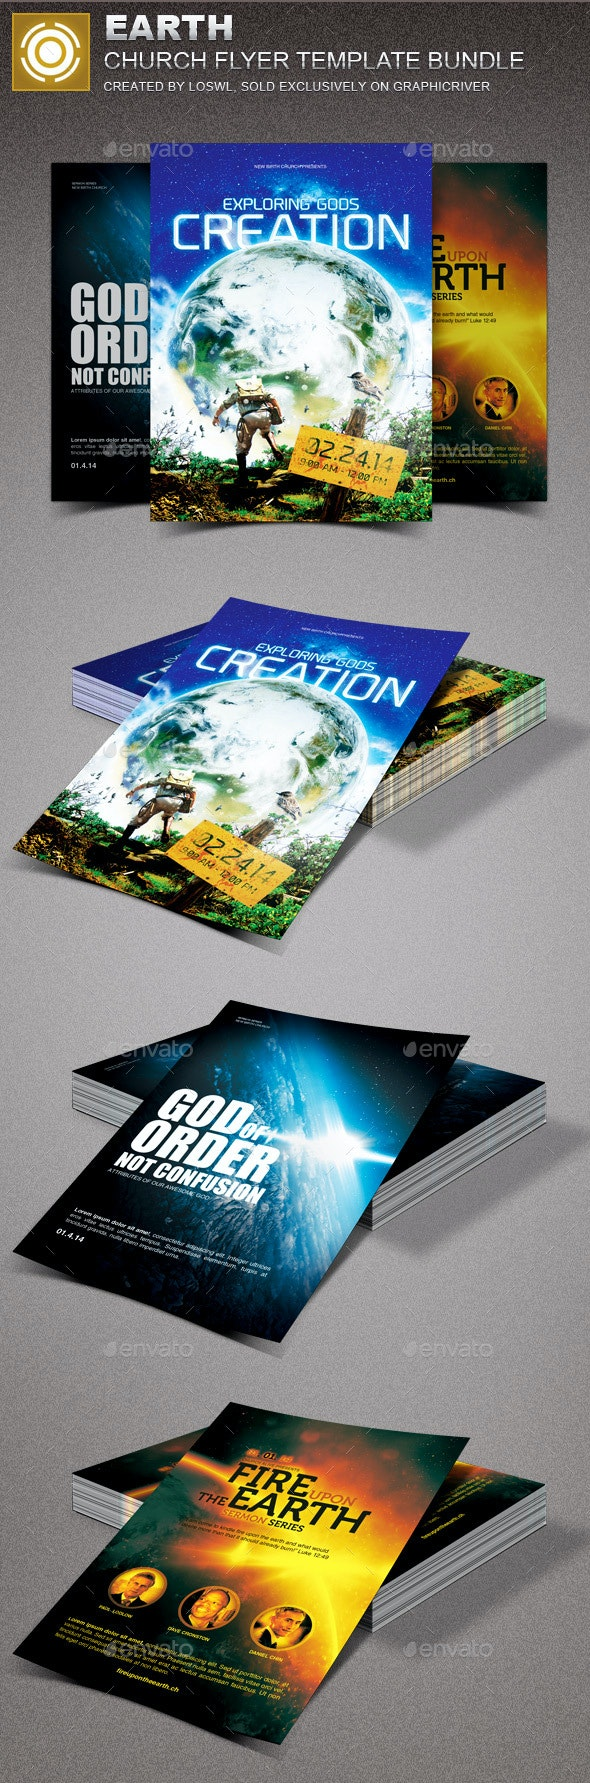 Earth Church Marketing Flyer Template Bundle - Church Flyers